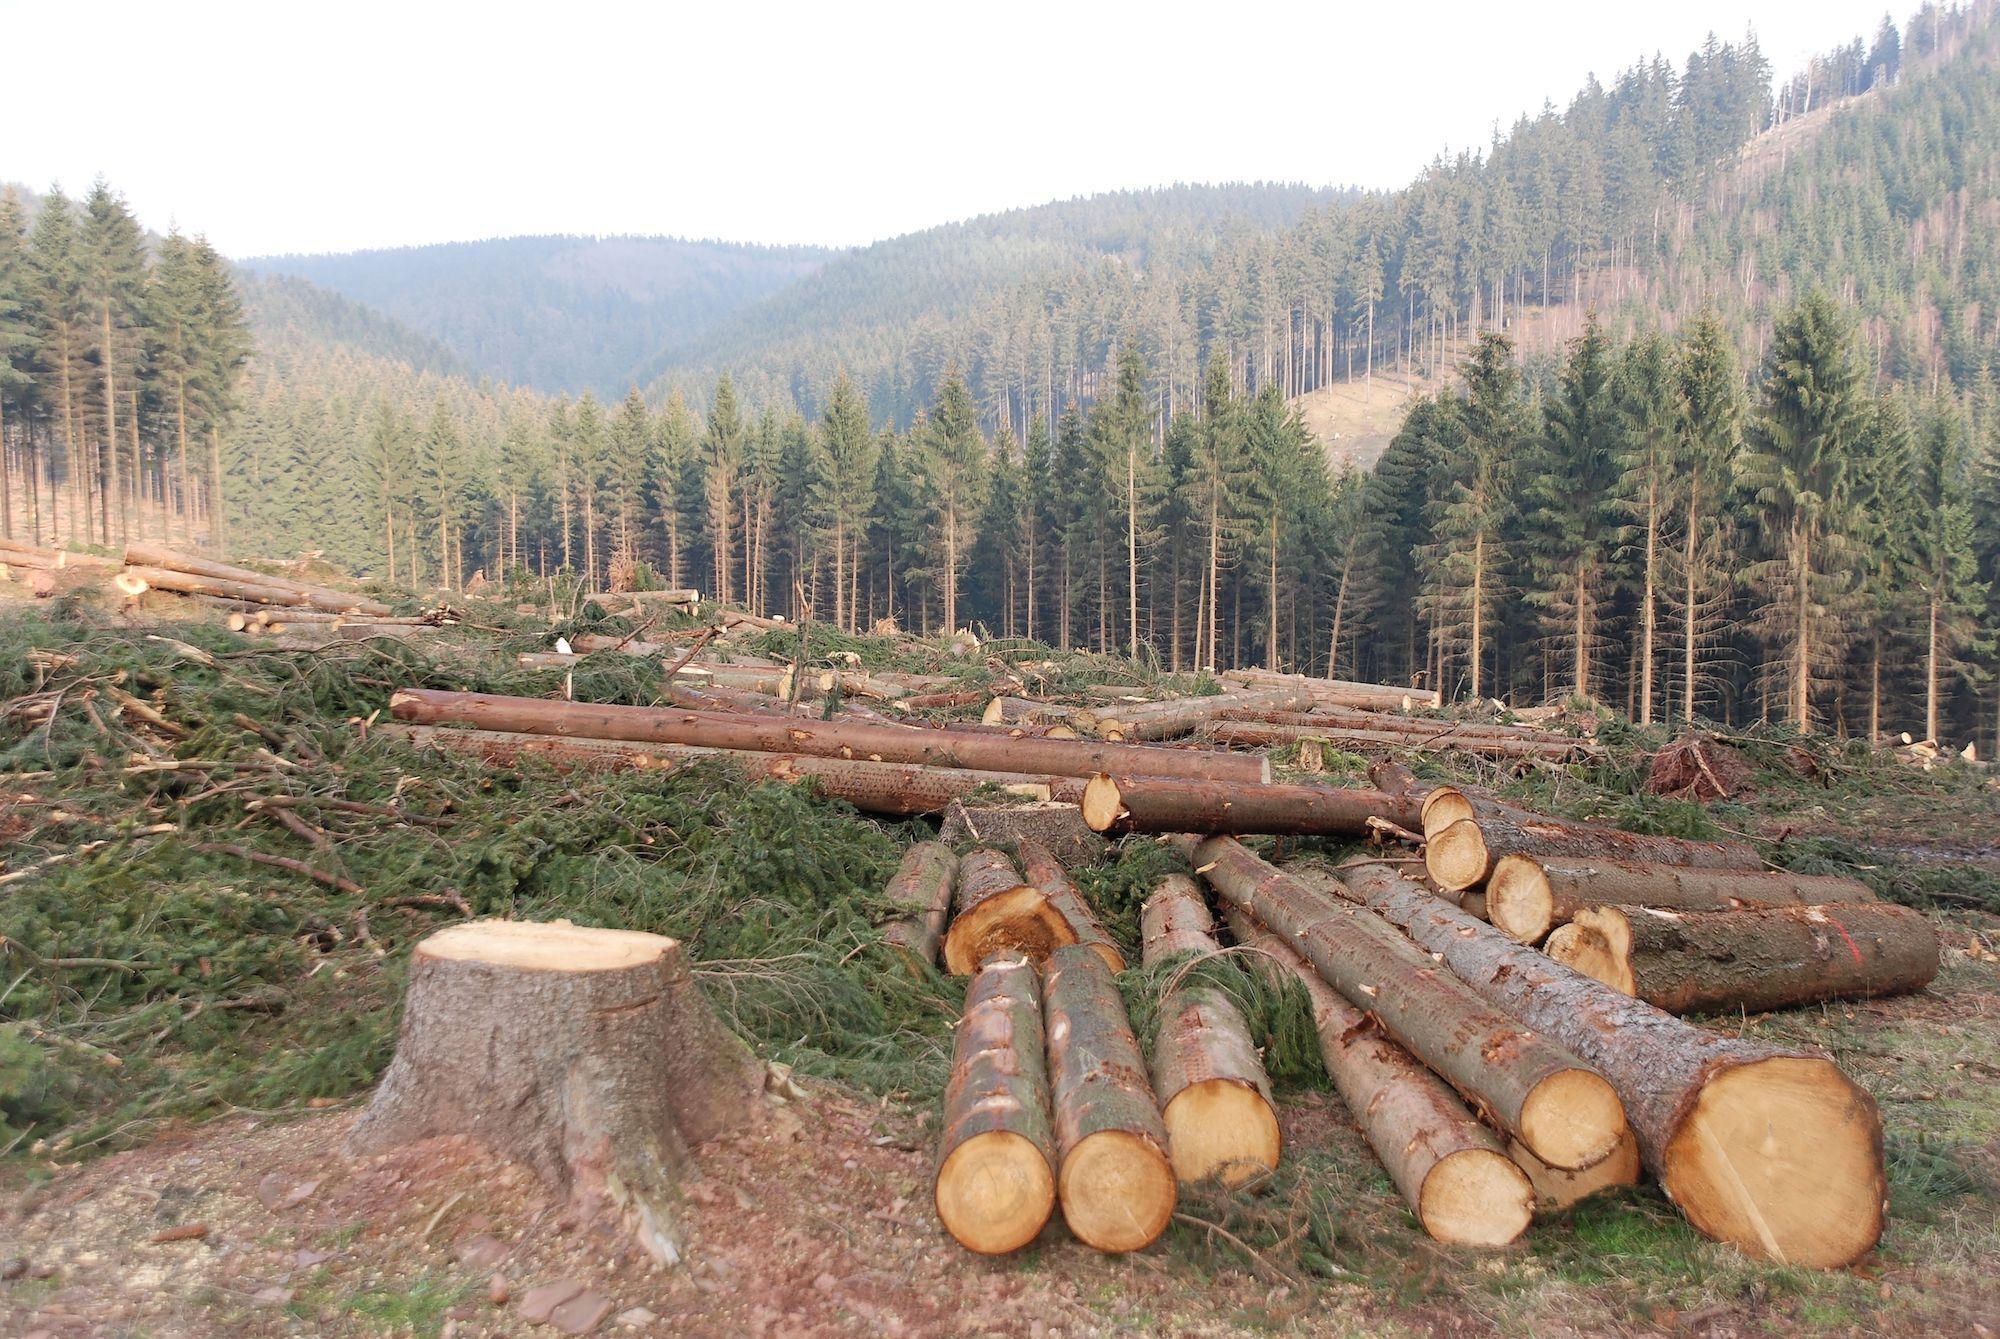 https://climatetransform.com/wp-content/uploads/2020/05/Deforestation.jpg